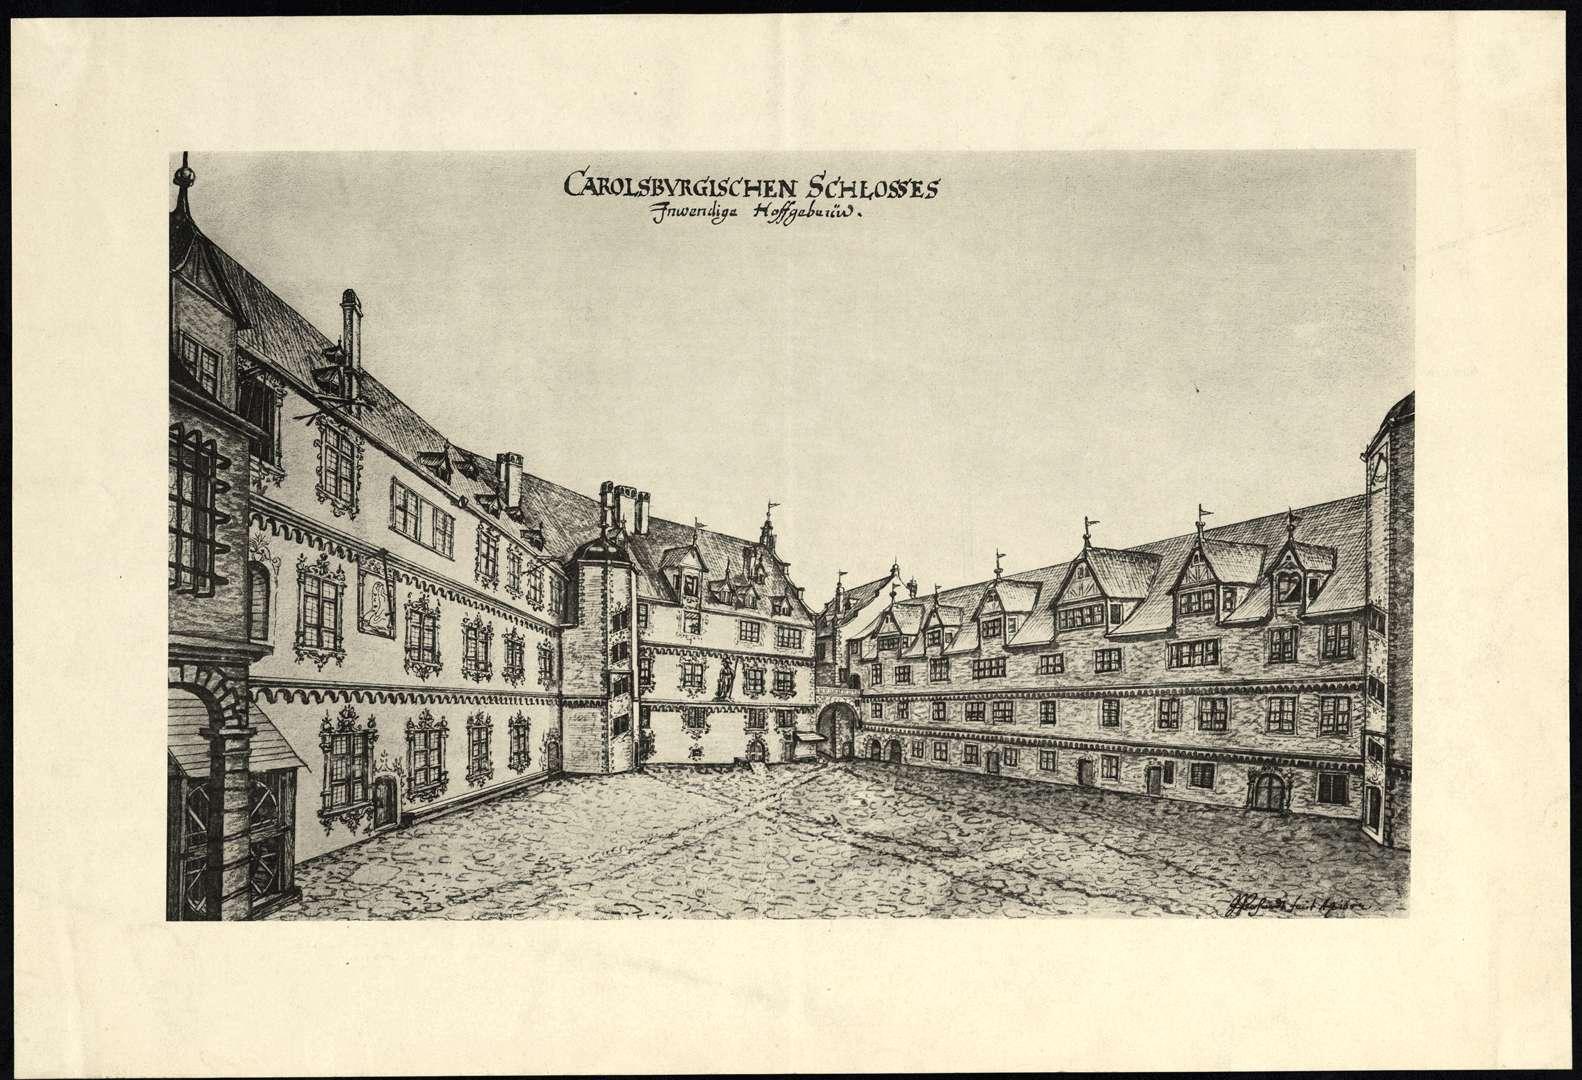 Carolsburgischen Schlosses Inwendige Hoffgebäwd, Bild 1